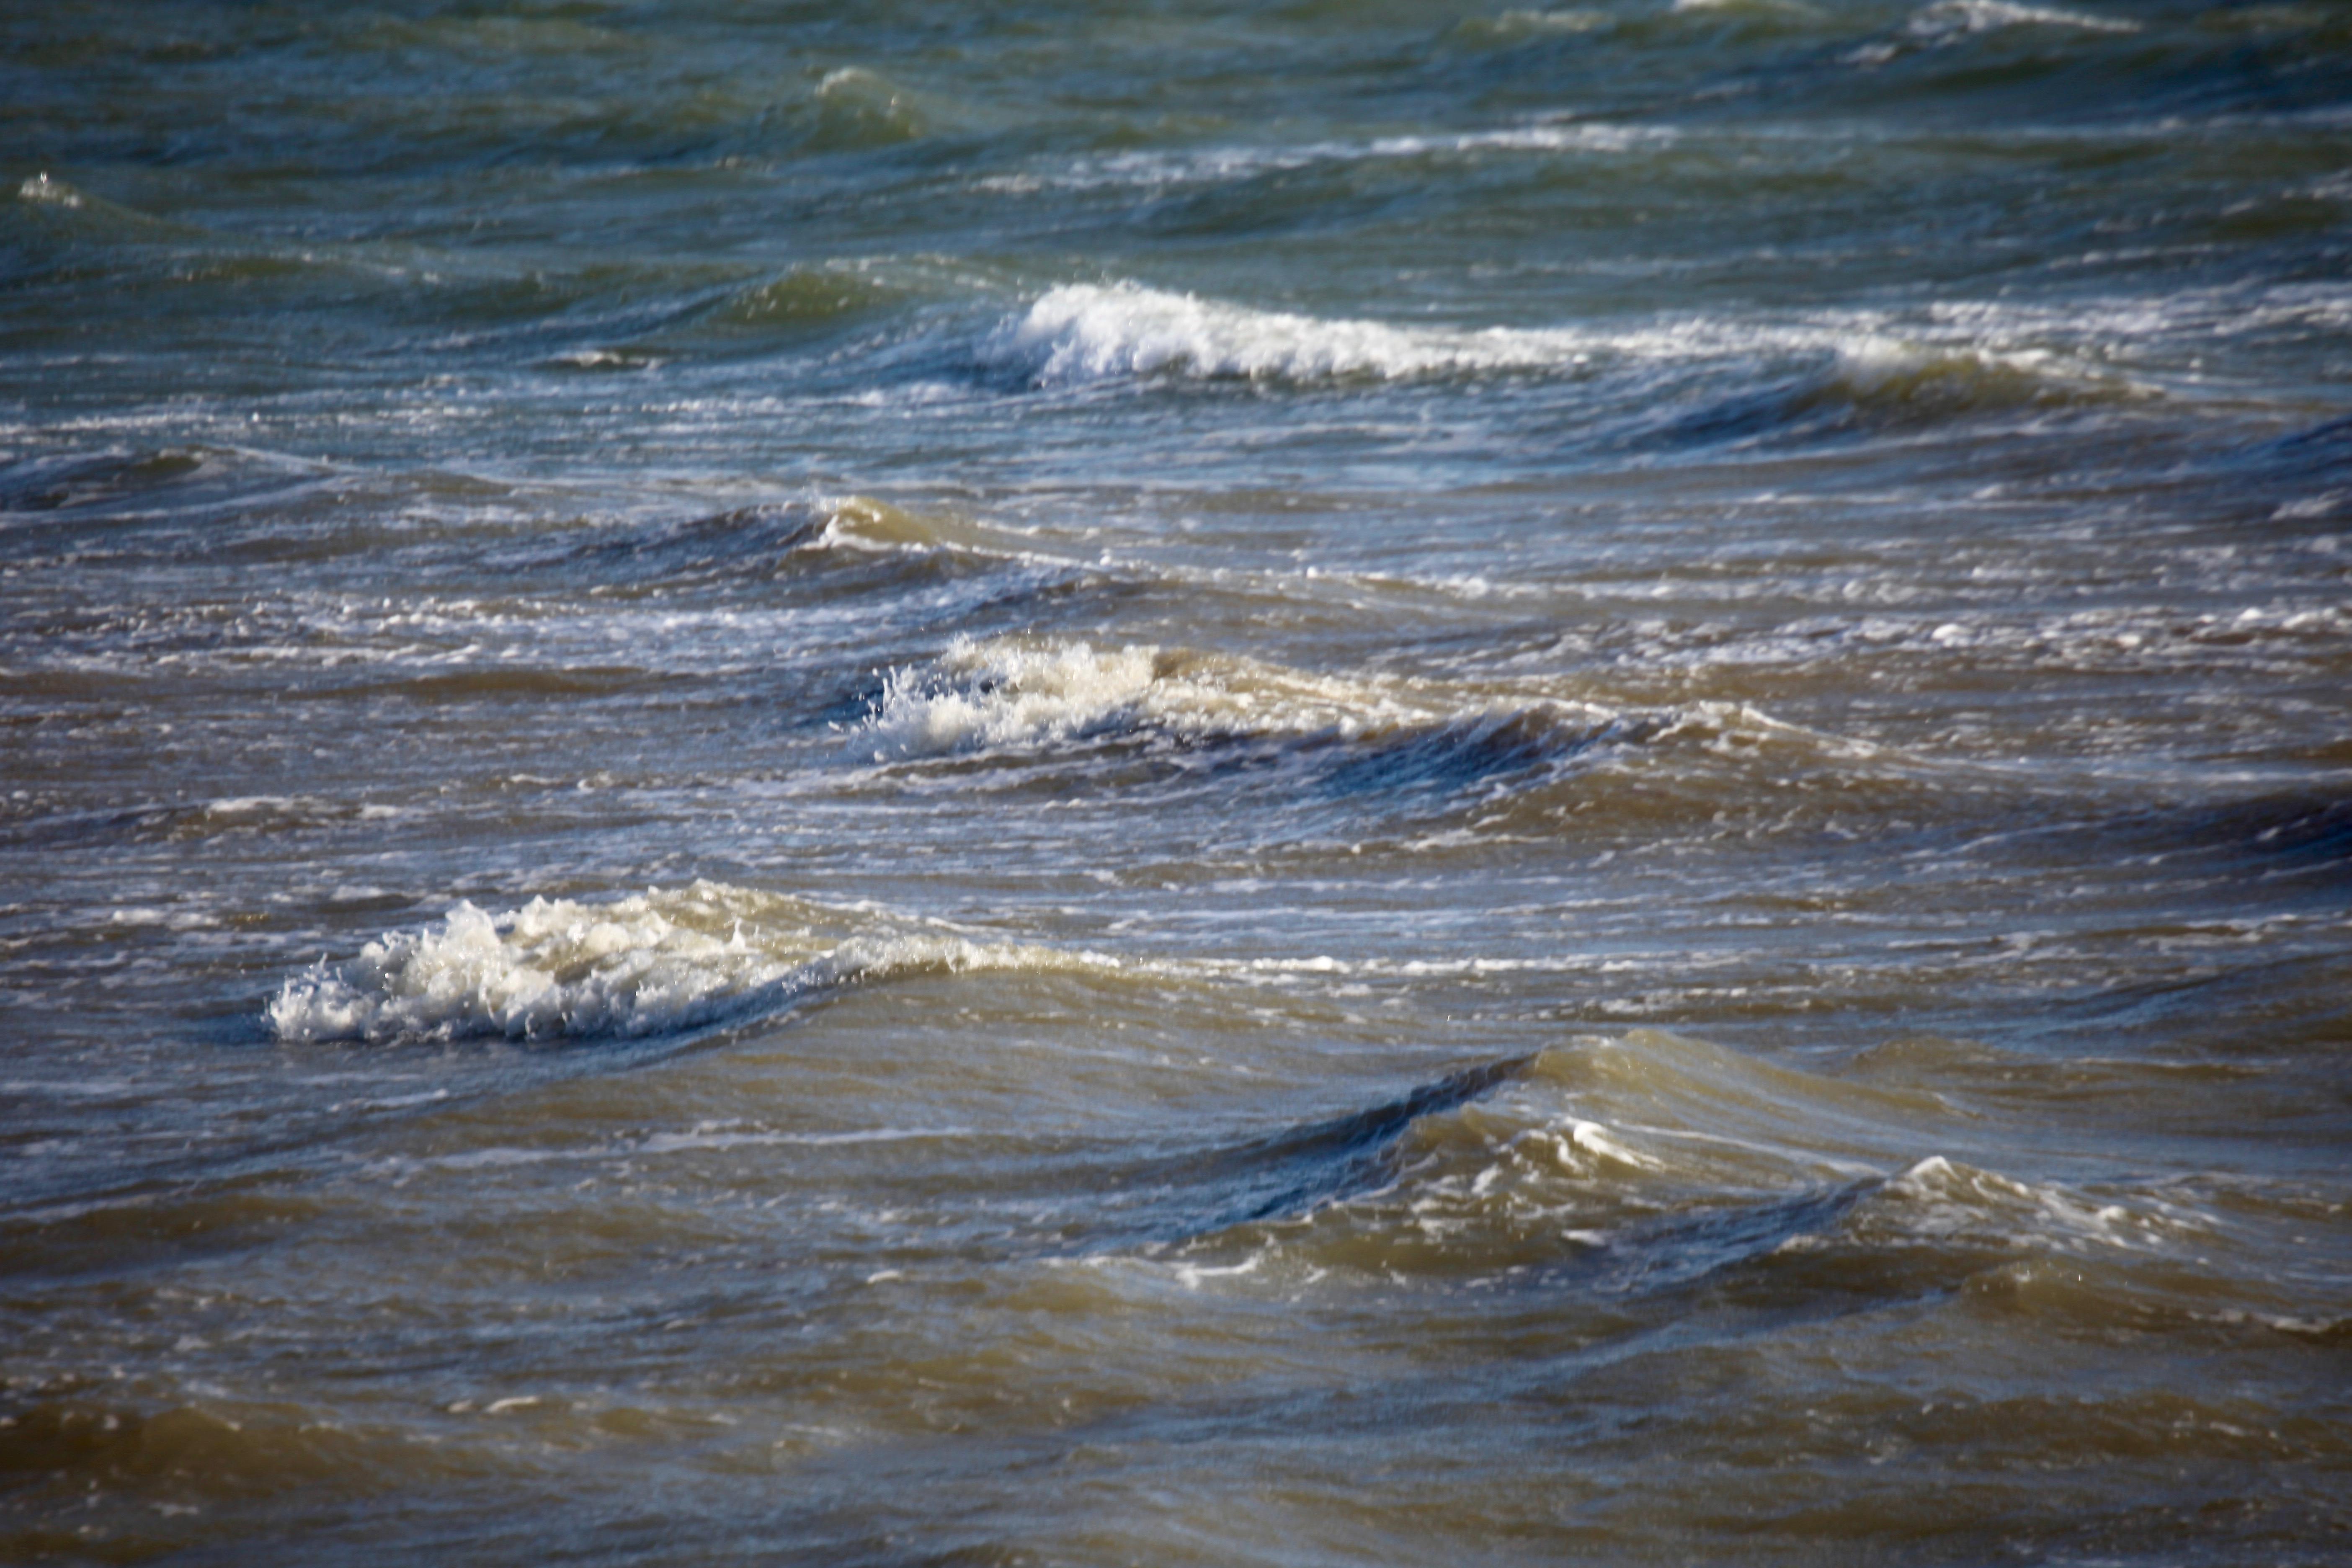 Waves 3